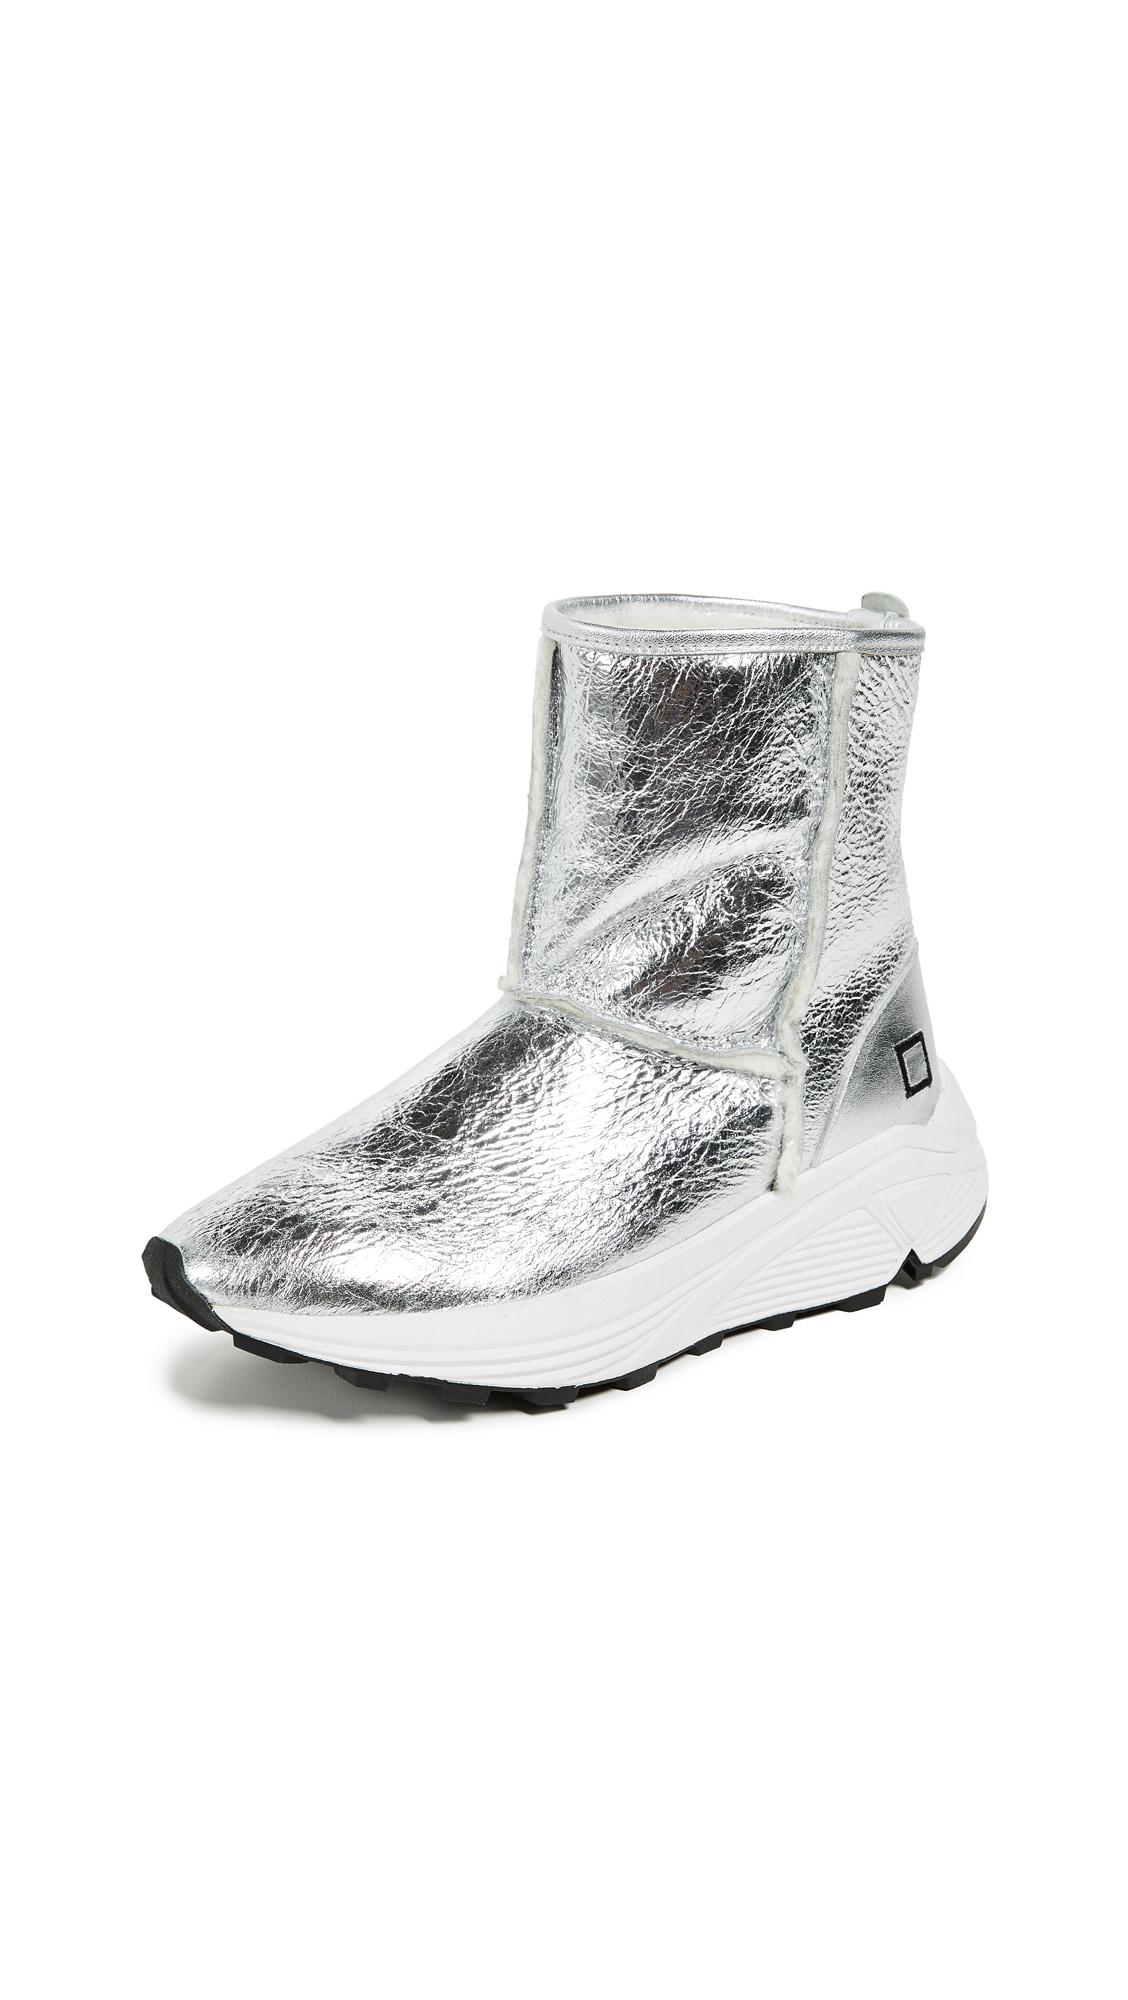 D.A.T.E. Dafne Sherpa Laminated Sneakers In Silver